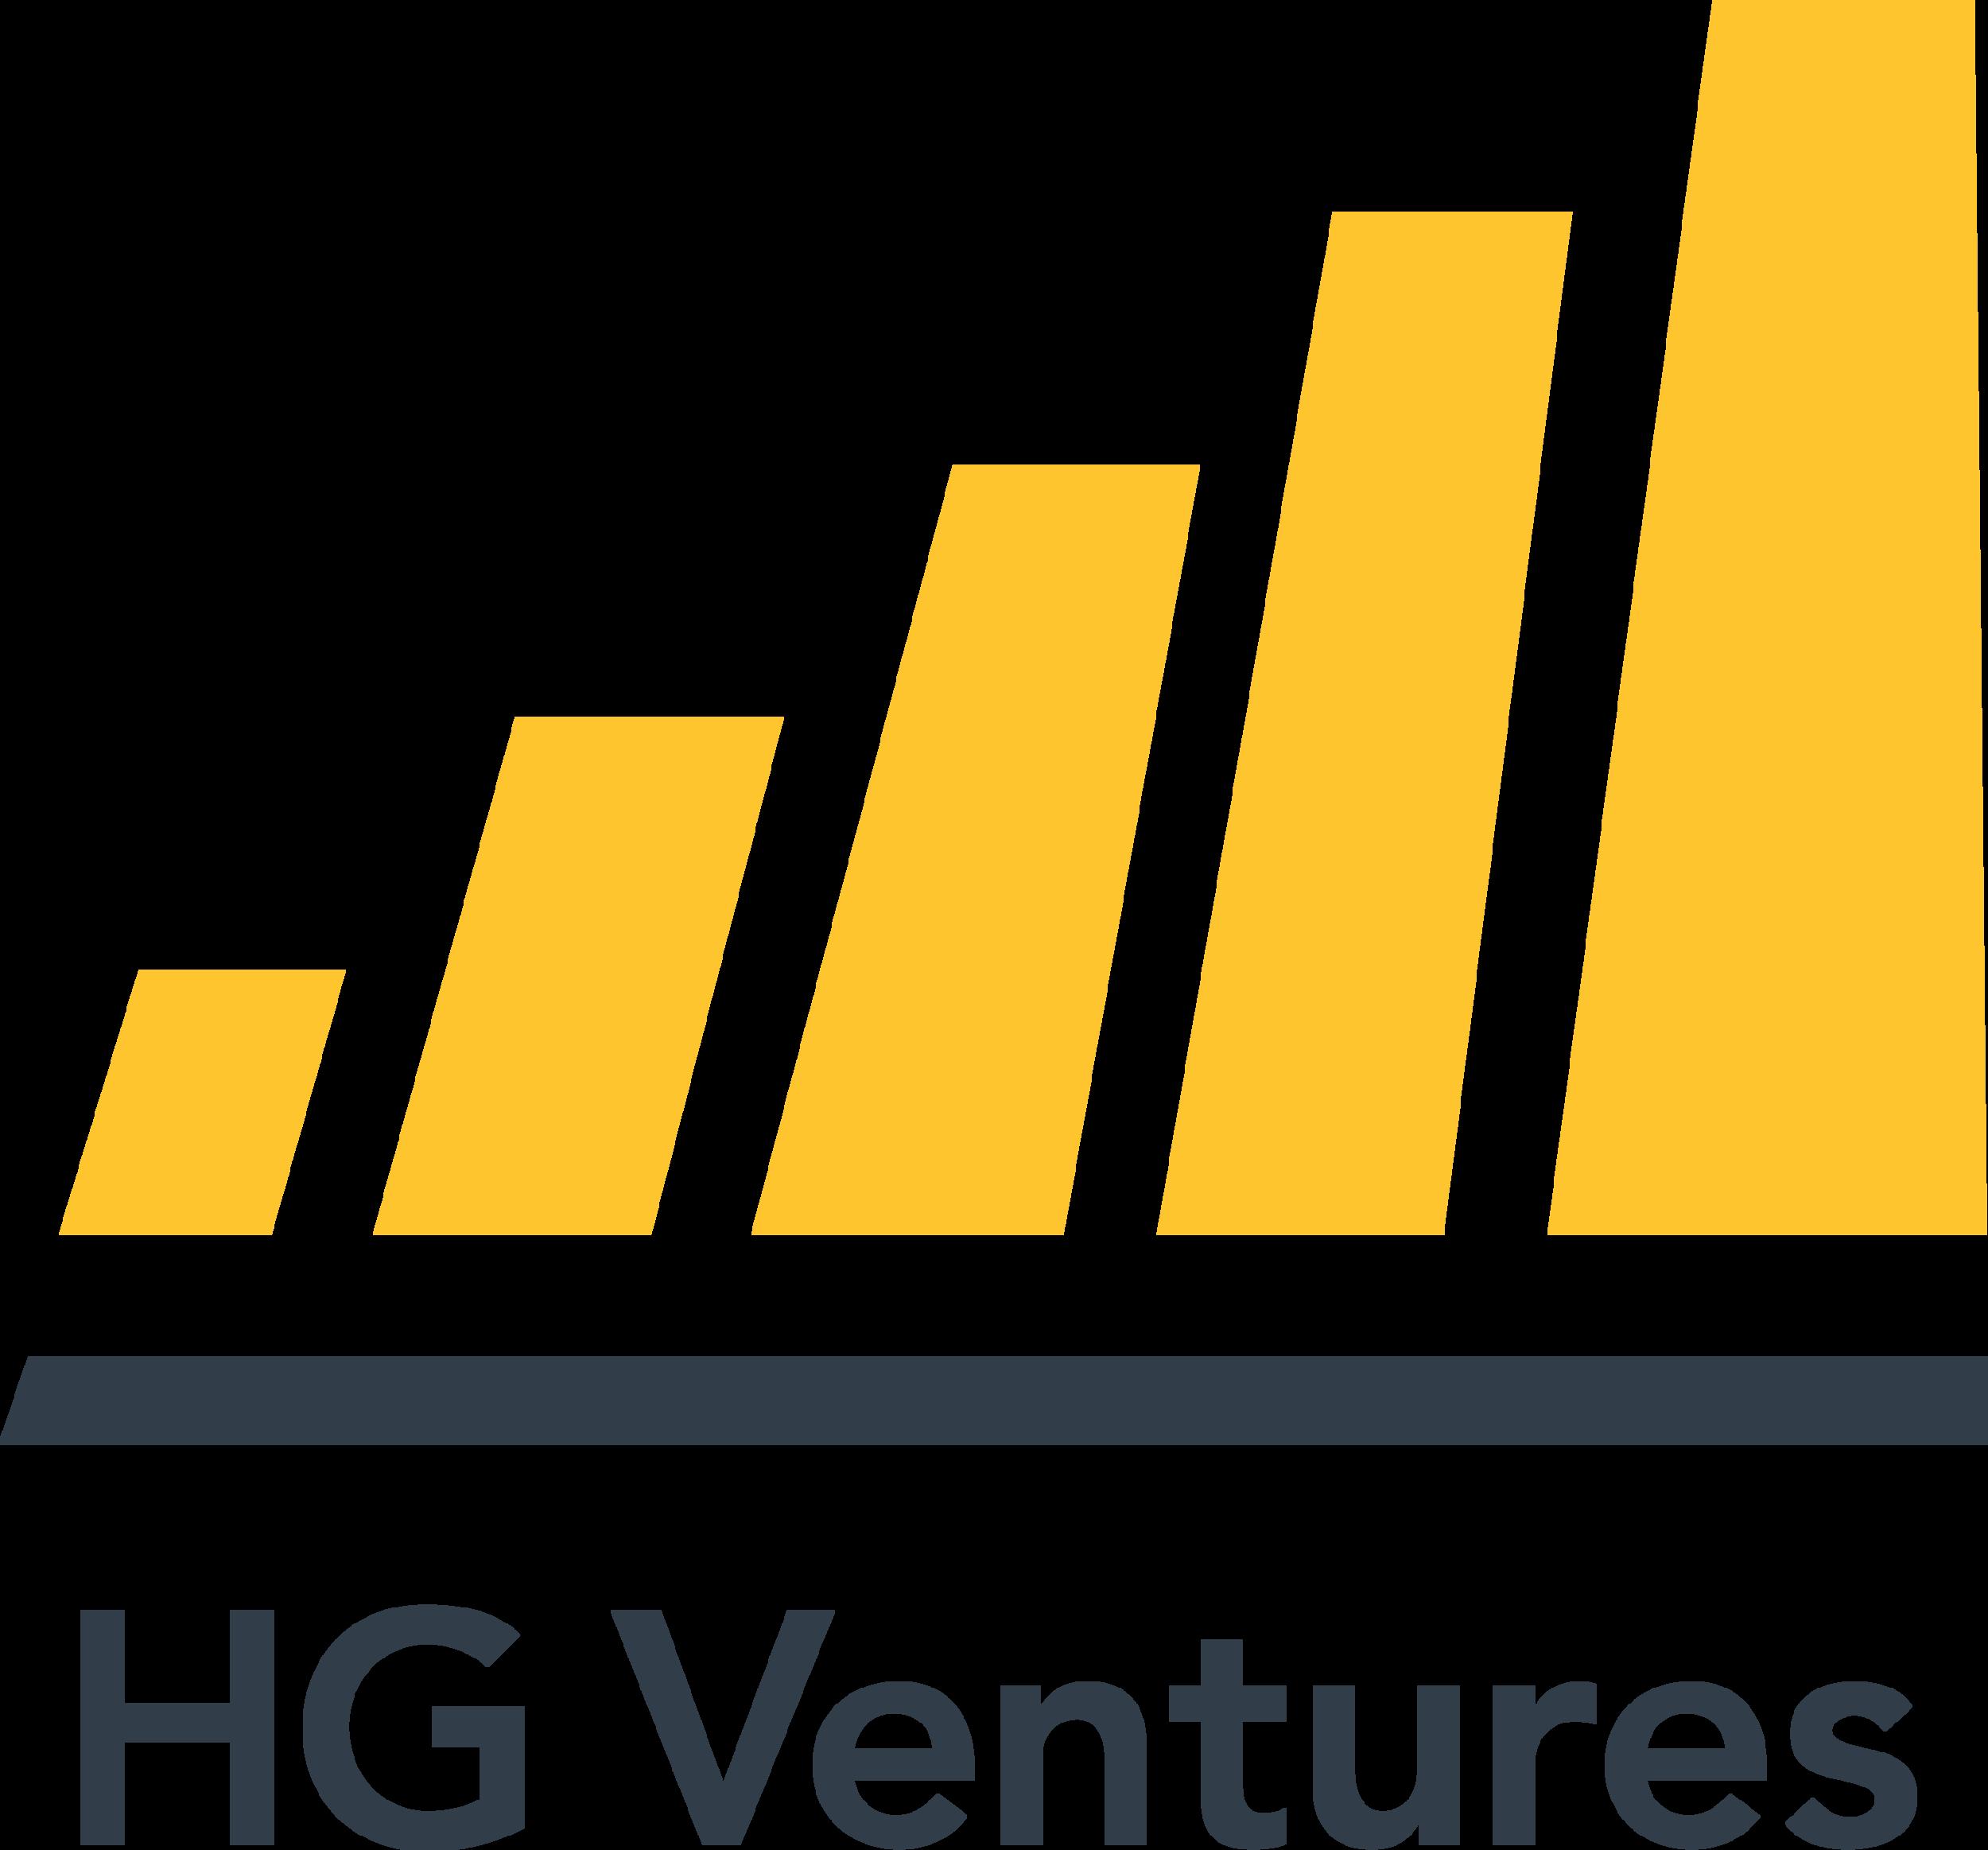 HG Ventures.png